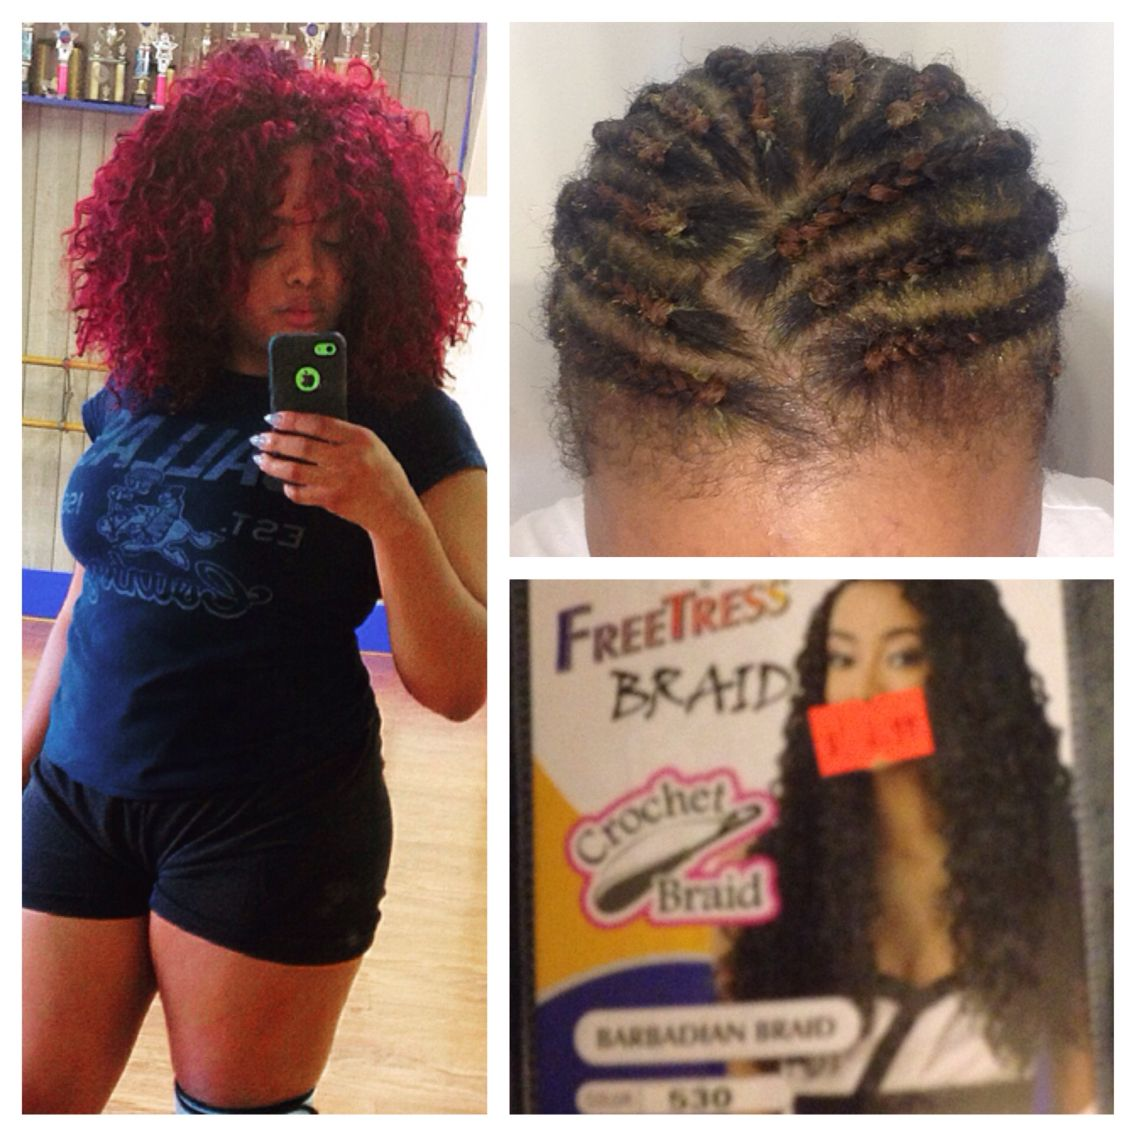 Does crochet braid damage hair fastest - My New Do Crochet Braids With Barbadian Braid From Freetress 6 99 Pk